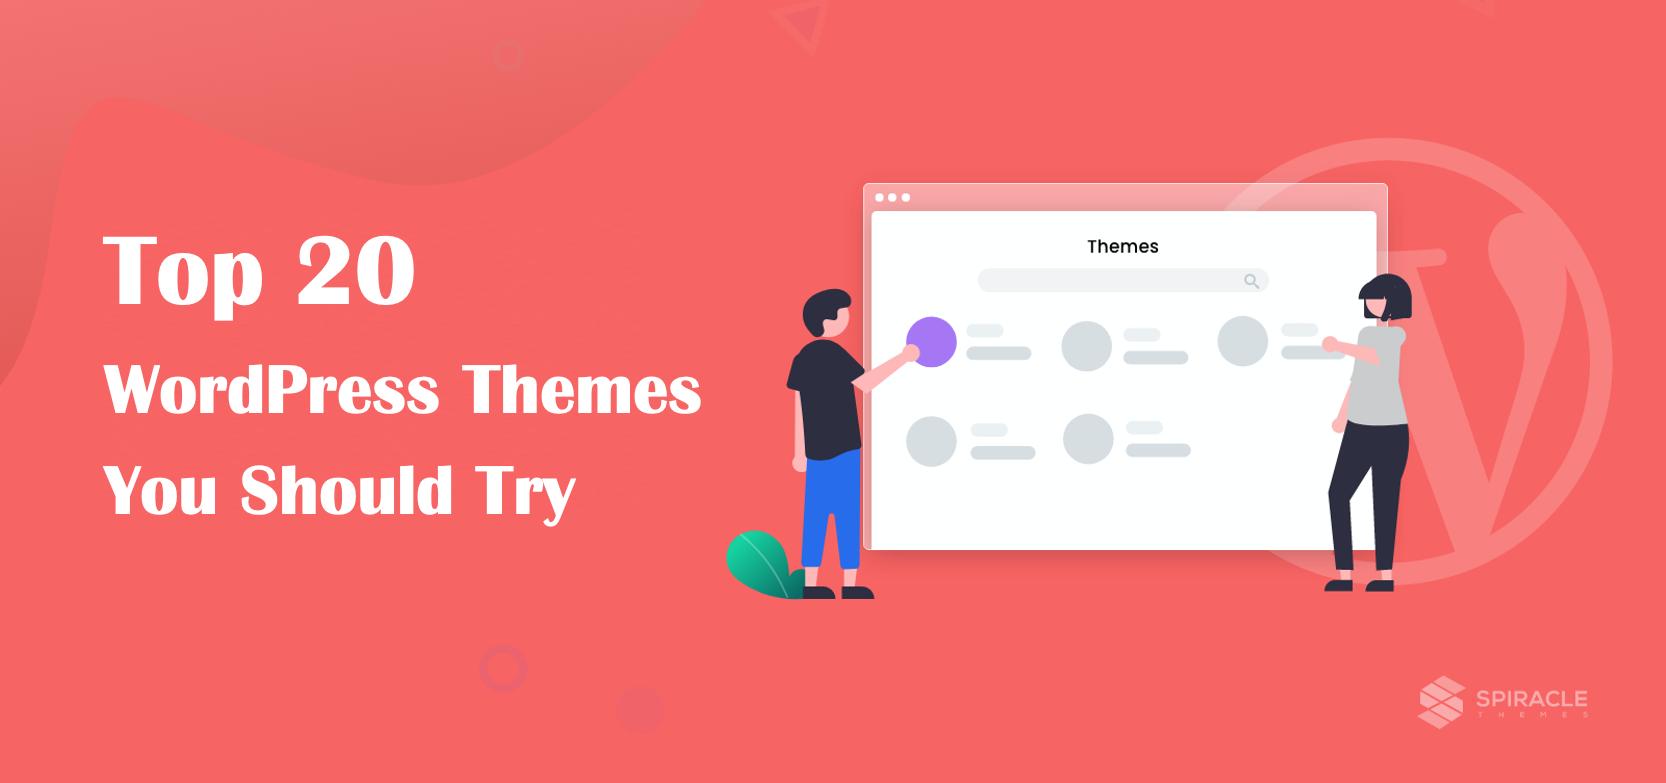 top 20 best WordPress themes